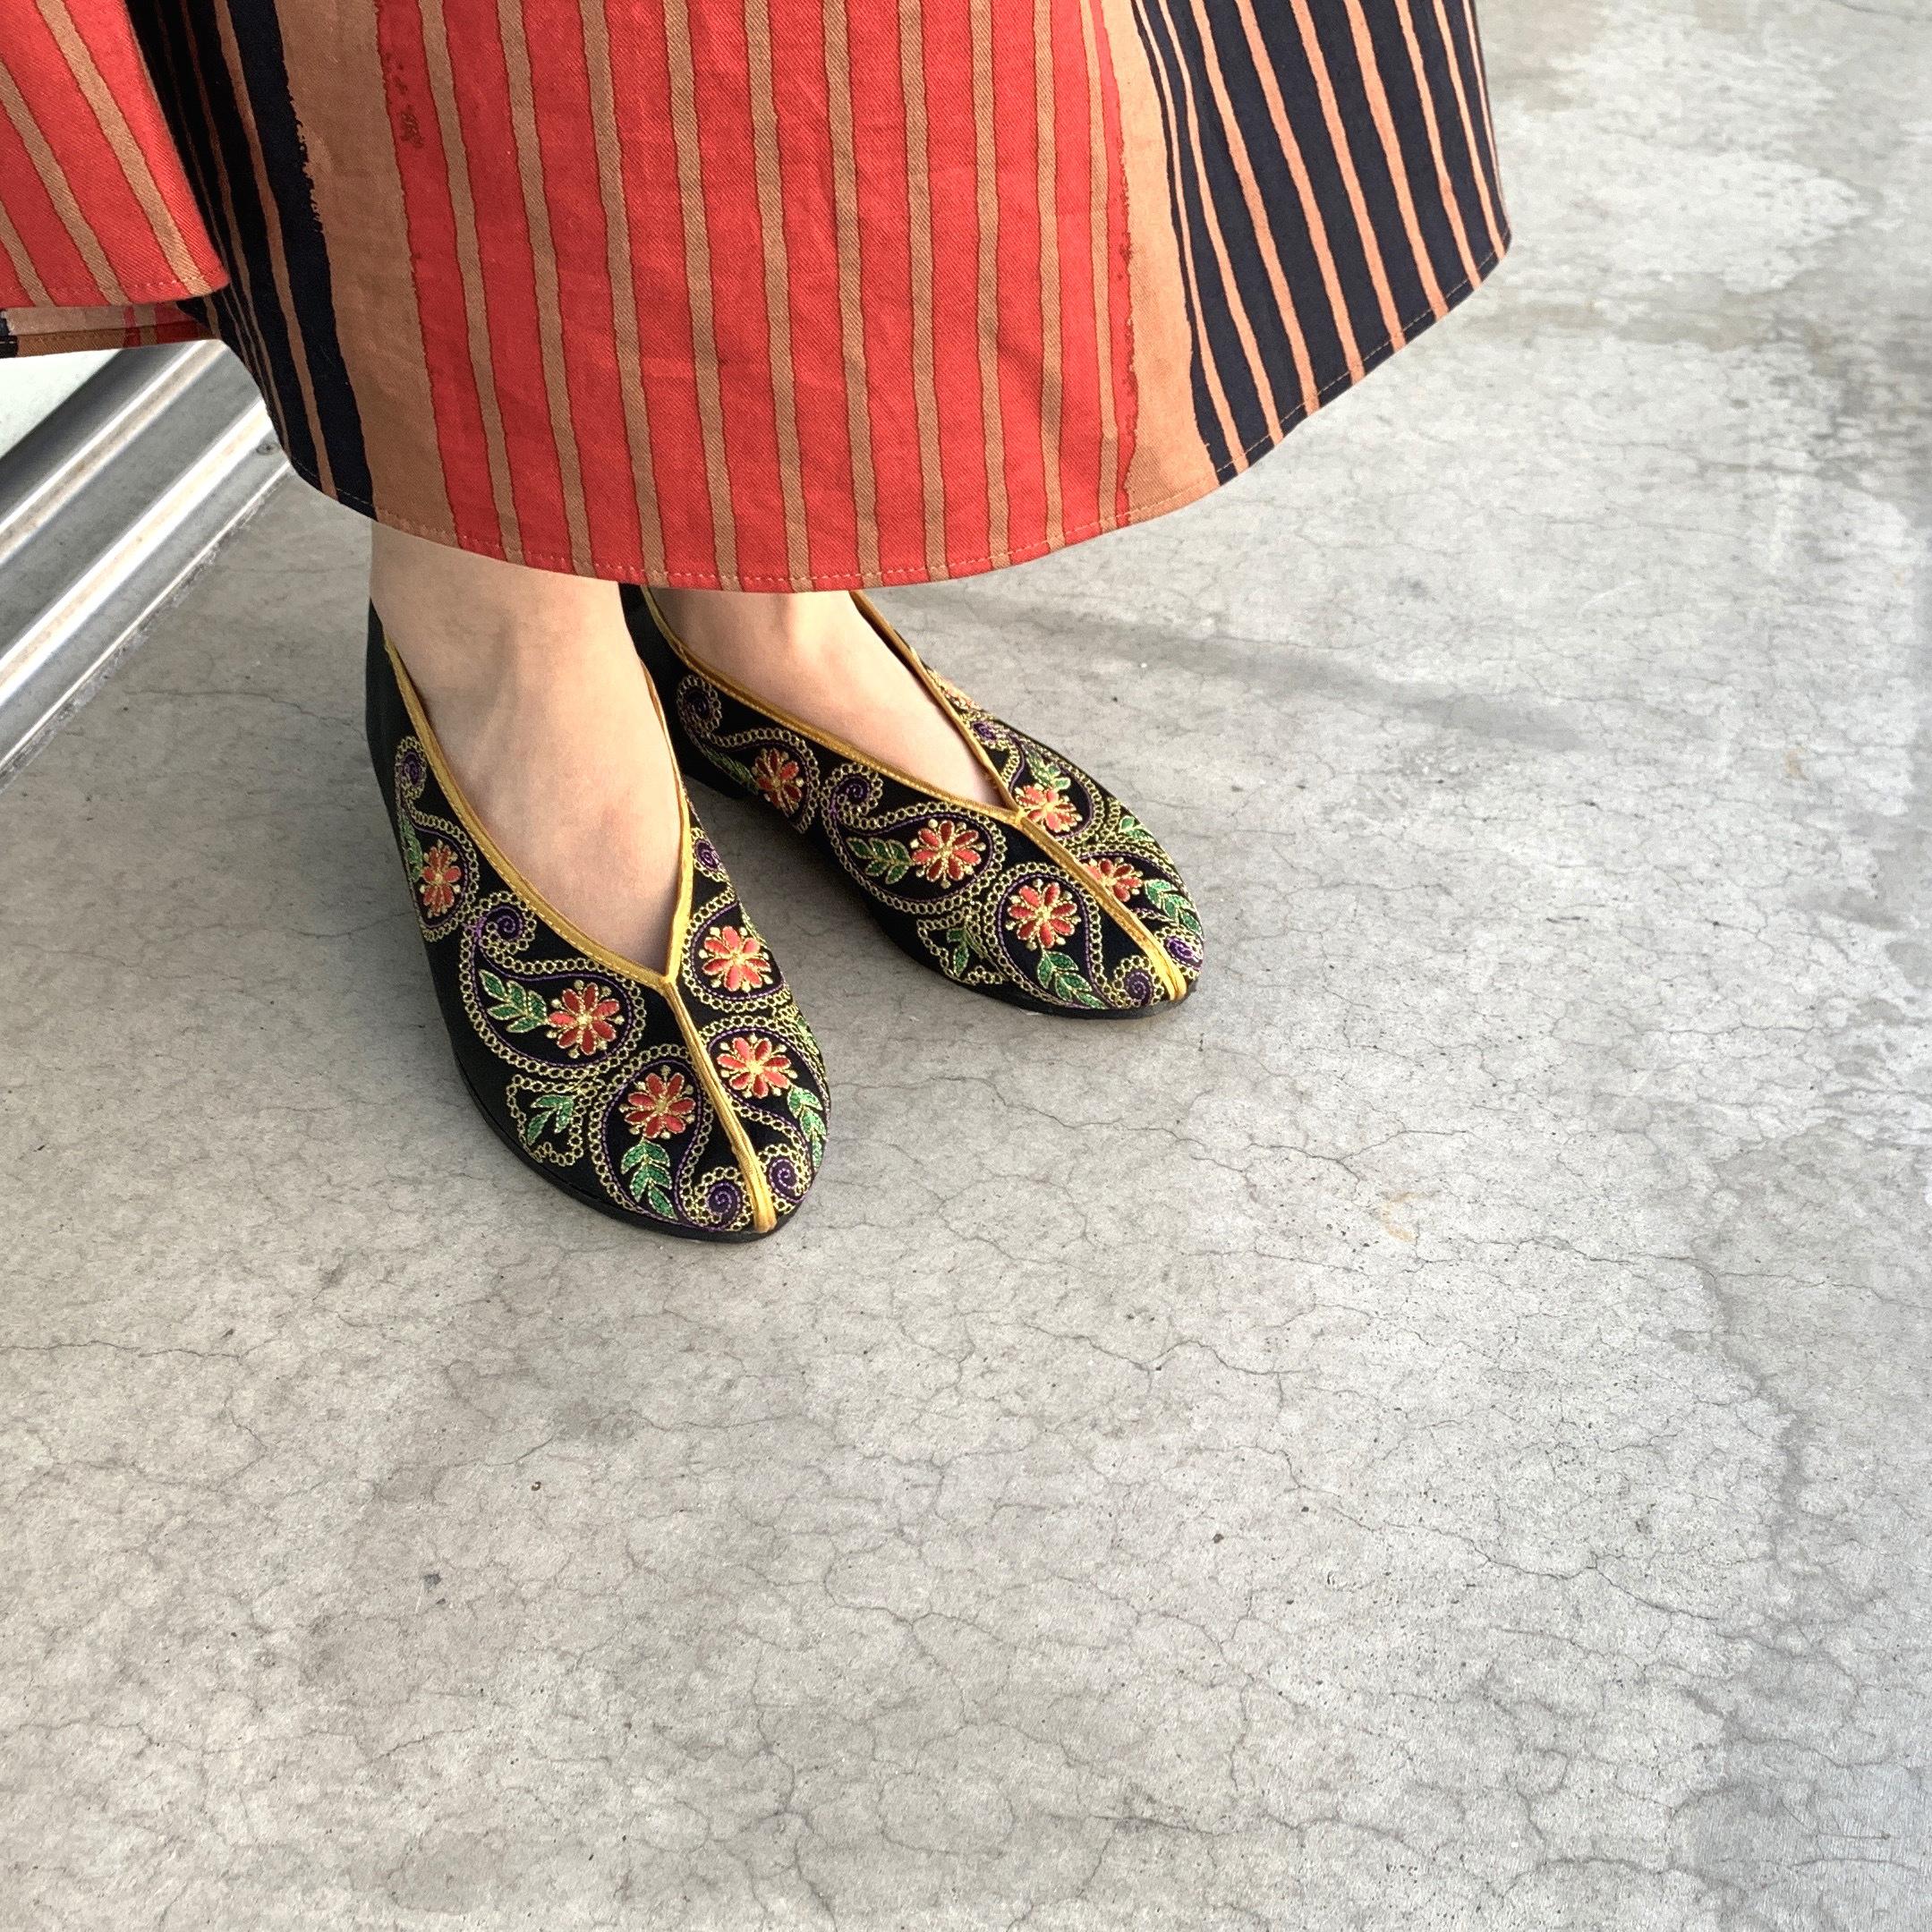 Taiwan China shoes 【台湾刺繍フラットシューズ】